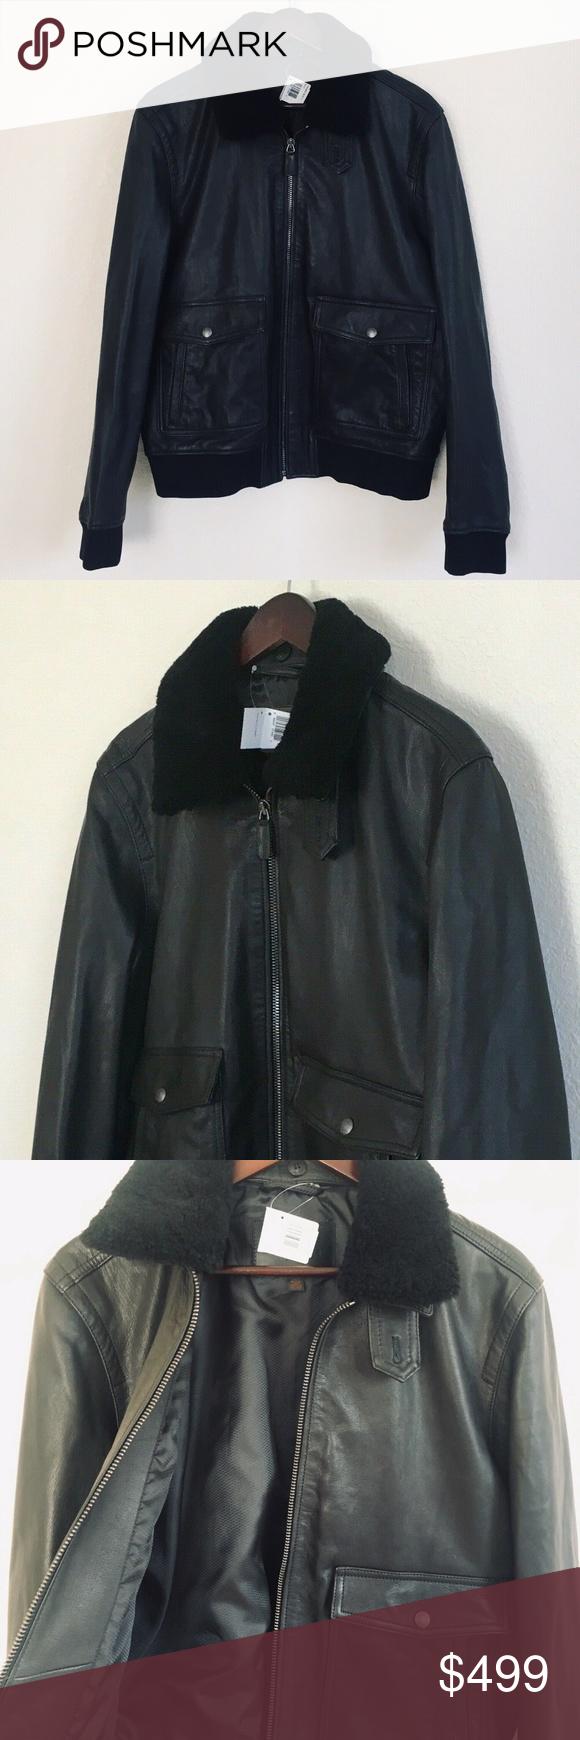 Coach Men Leather Shearling Collar Bomber Jacket Coach Men L Goat Leather Shearling Collar Bomber Jacket Black F84862 1 Clothes Design Jackets Fashion Design [ 1740 x 580 Pixel ]